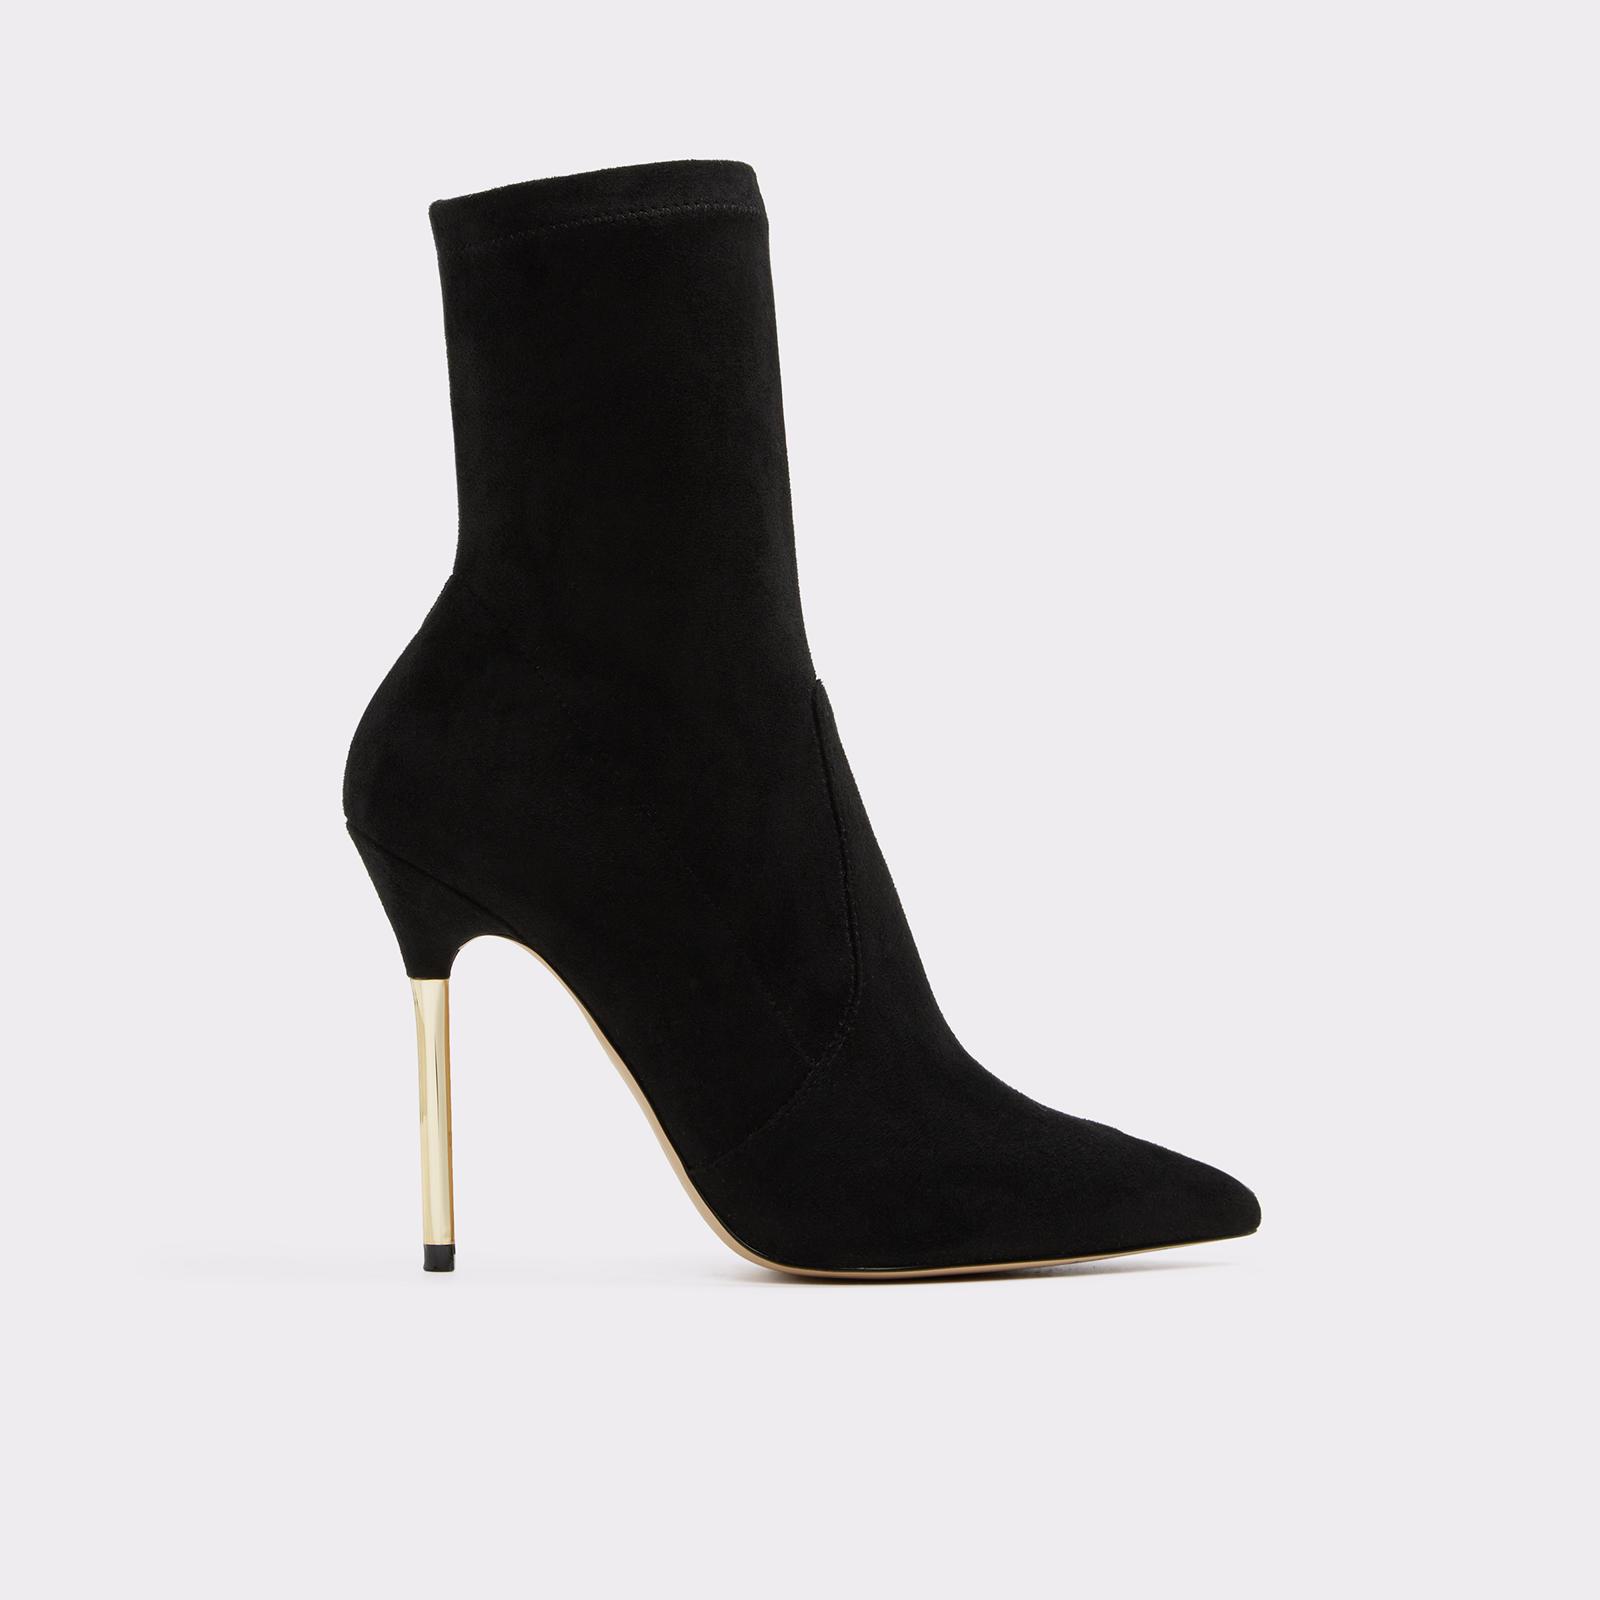 Cigarette Heel Black Boots